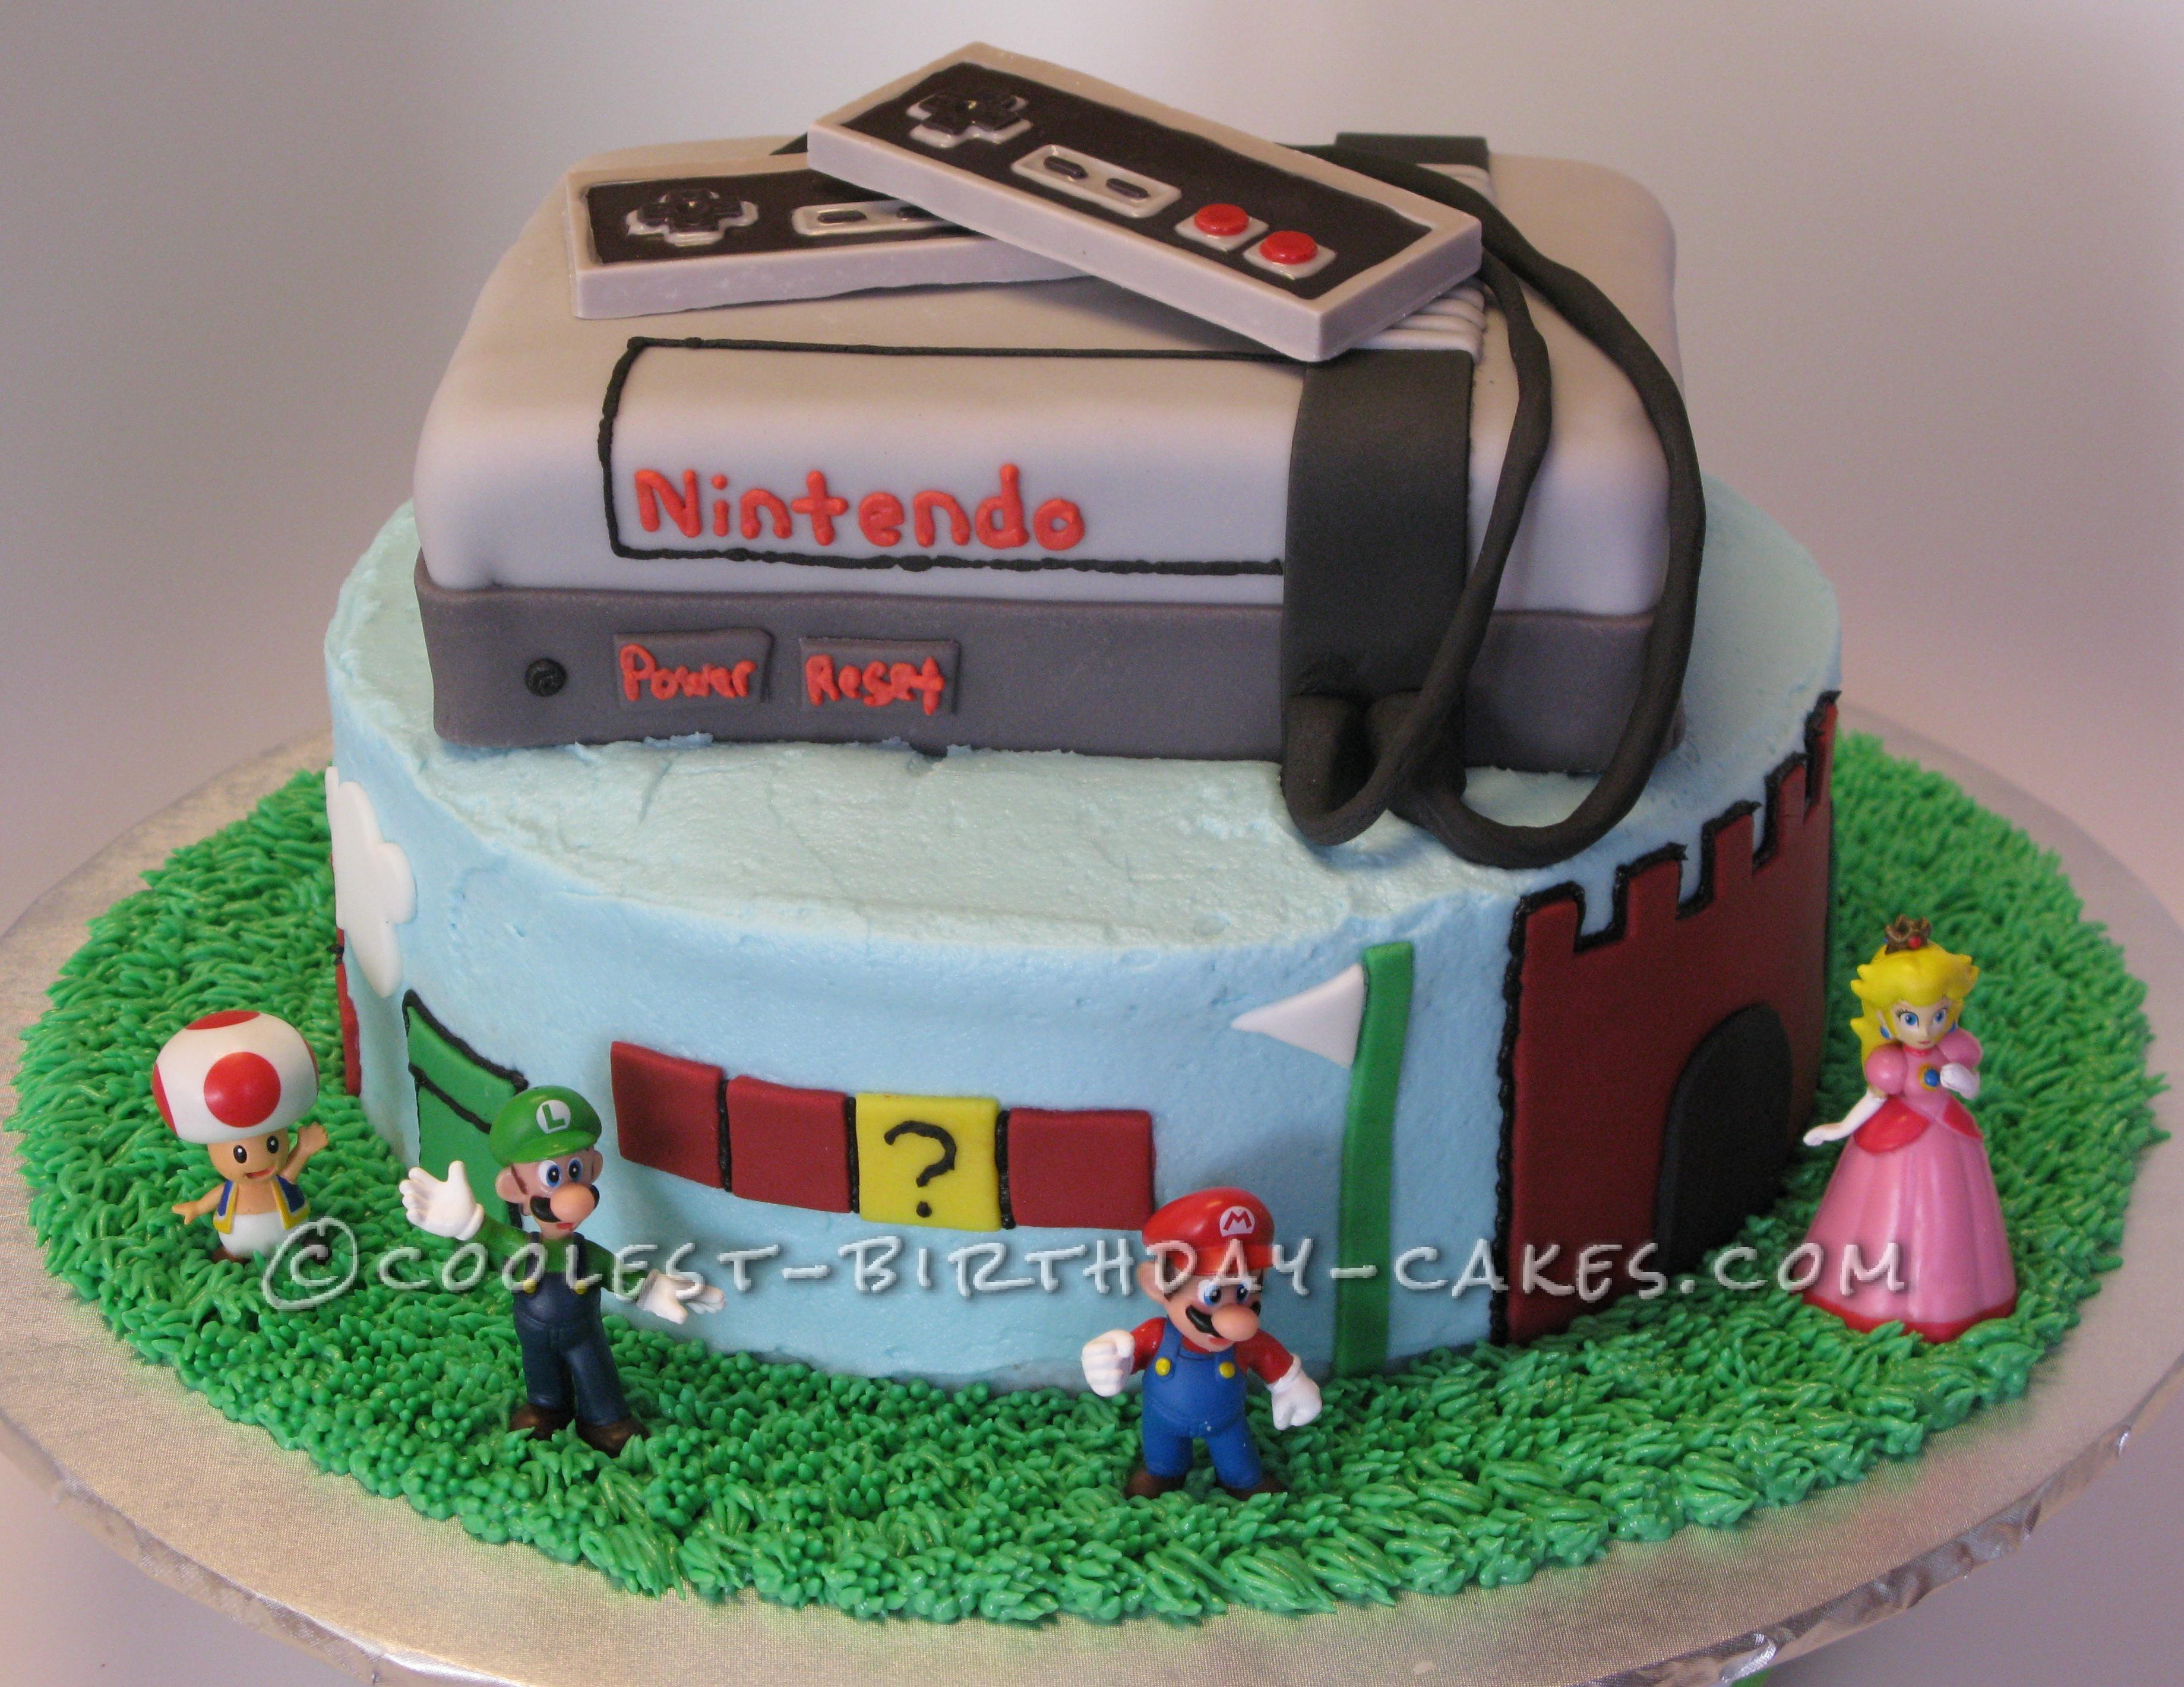 Nintendo's Super Mario Brothers Birthday Cake front view